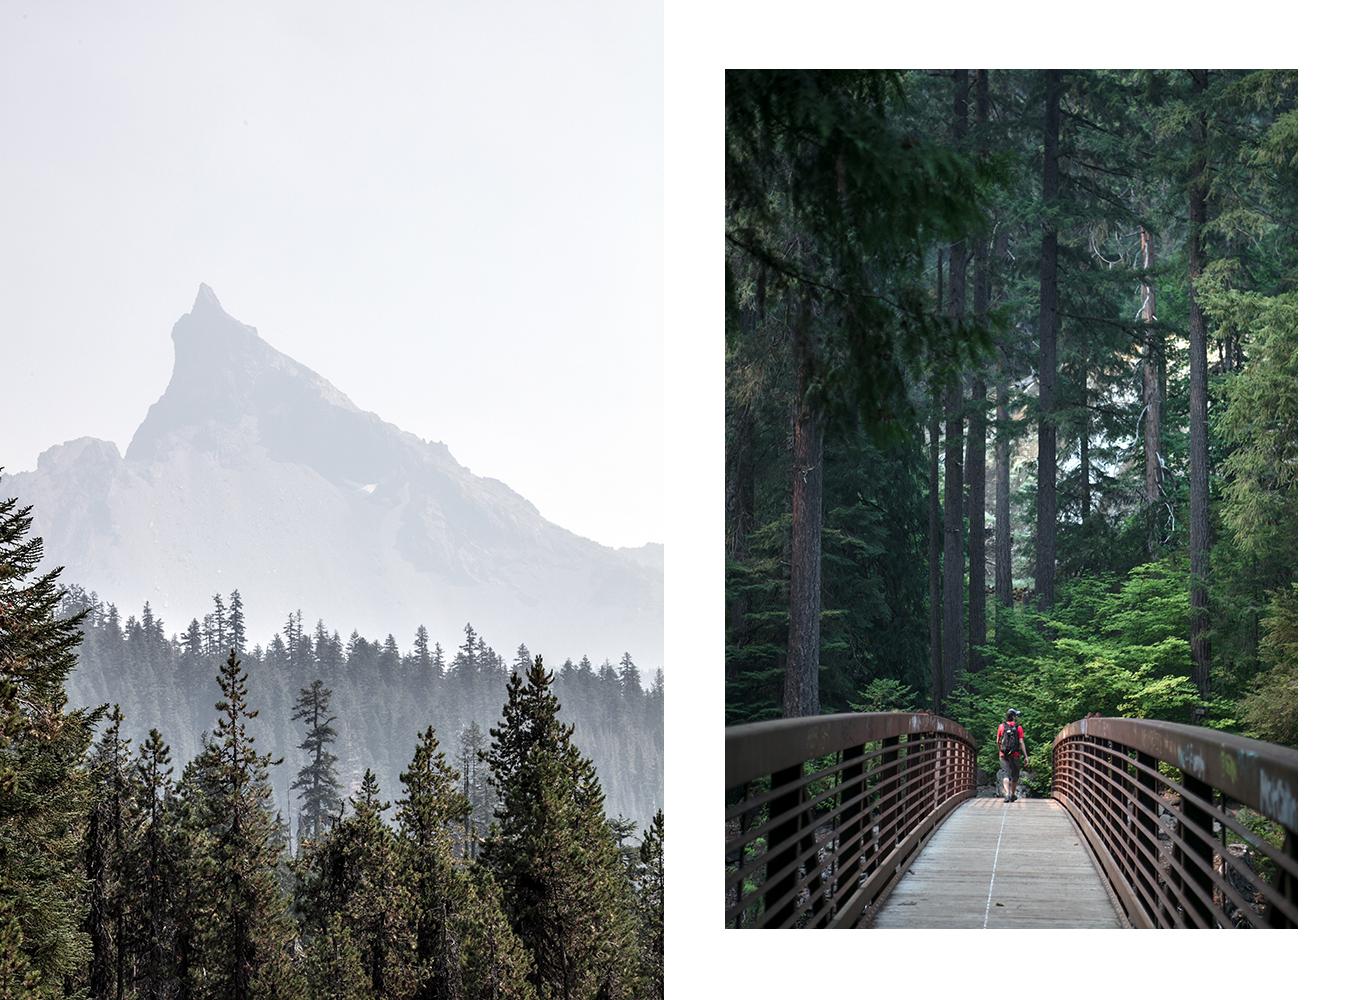 rando montagnes états-unis